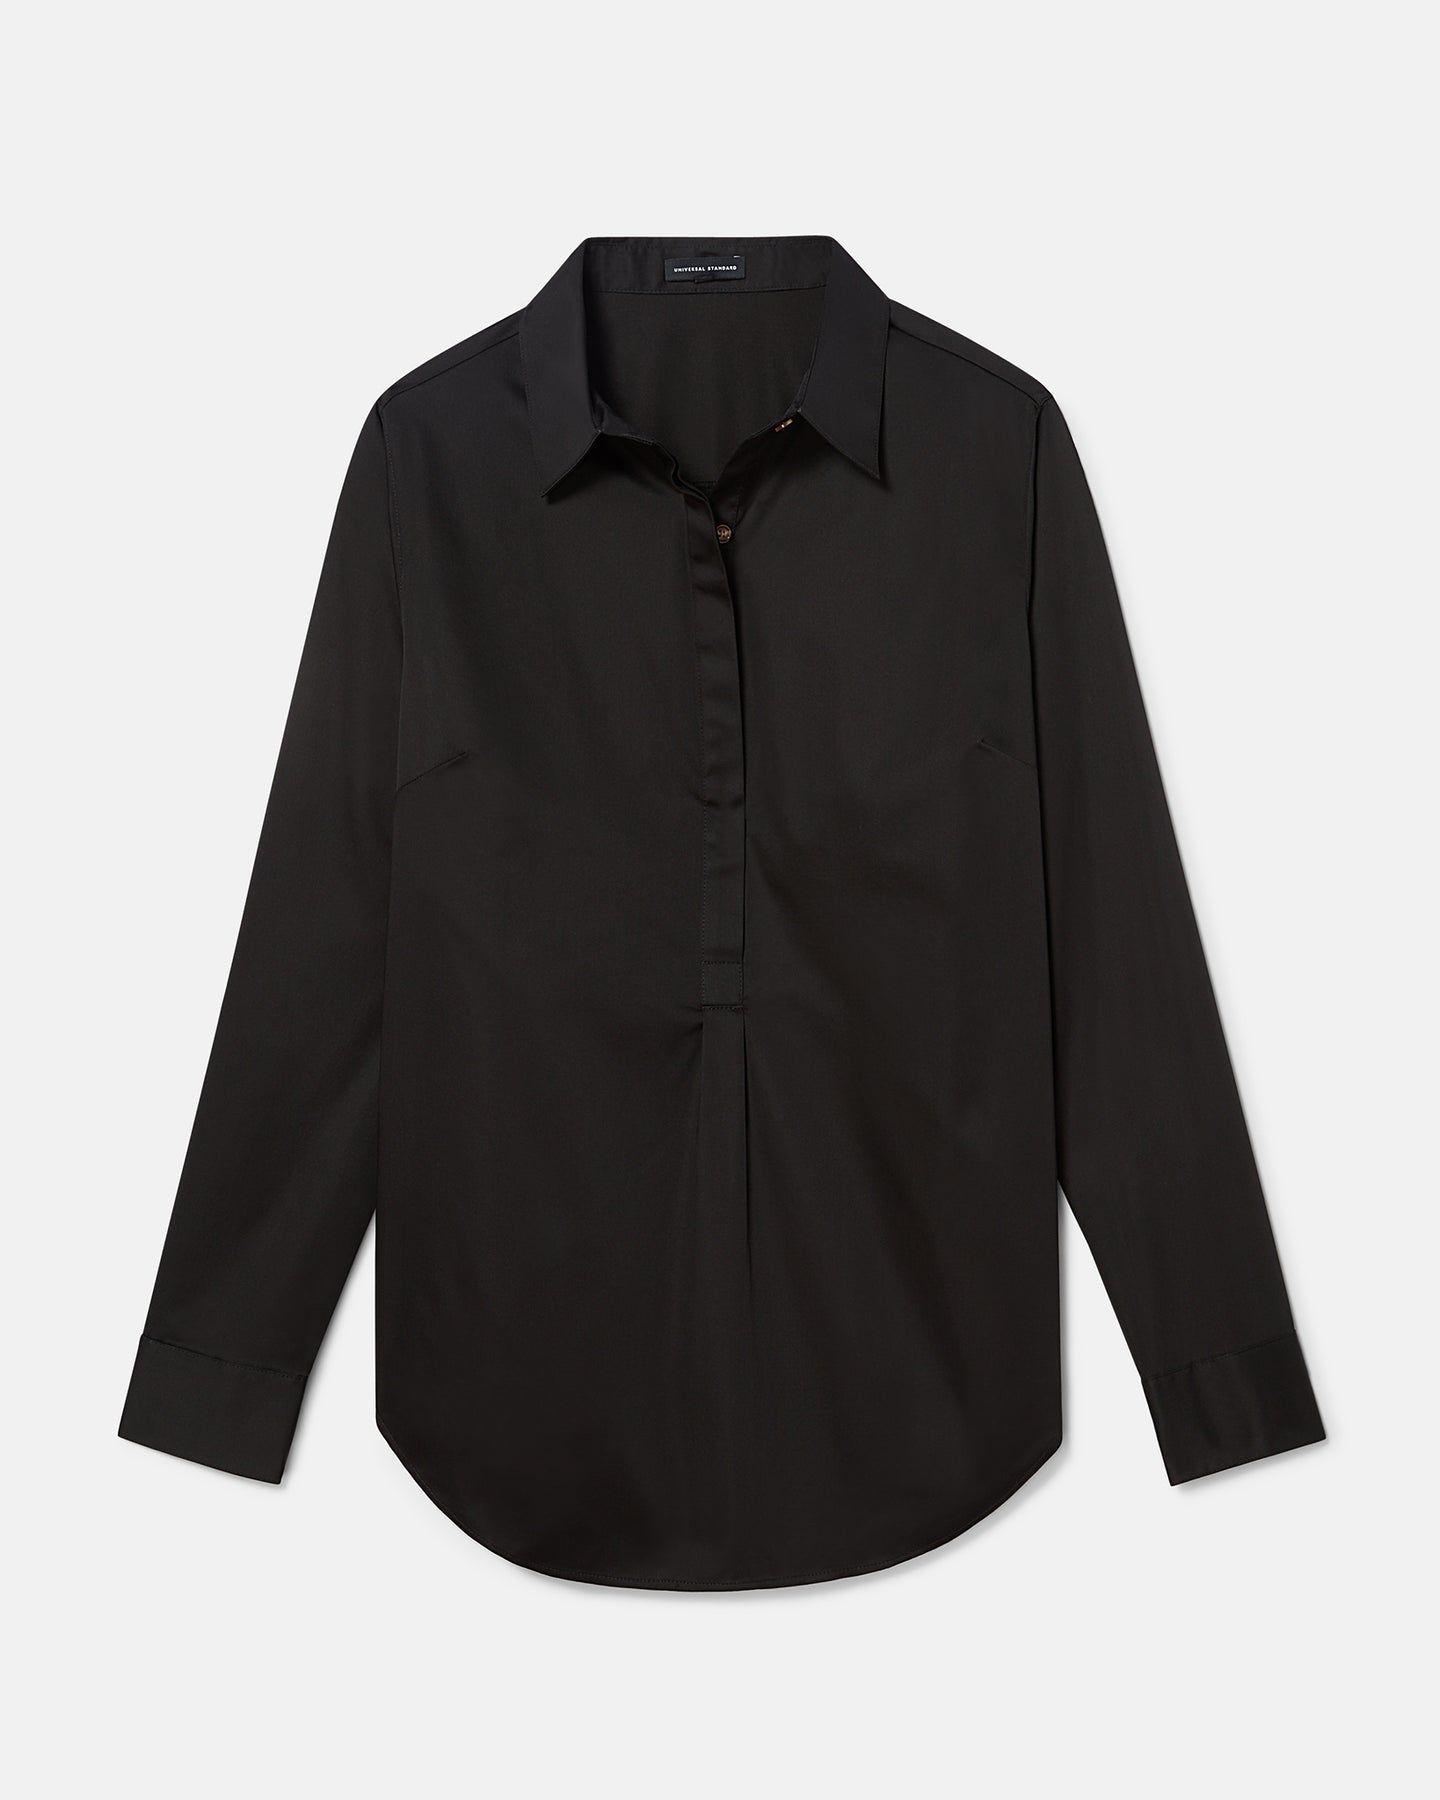 Elbe Shirt - Black - image 1